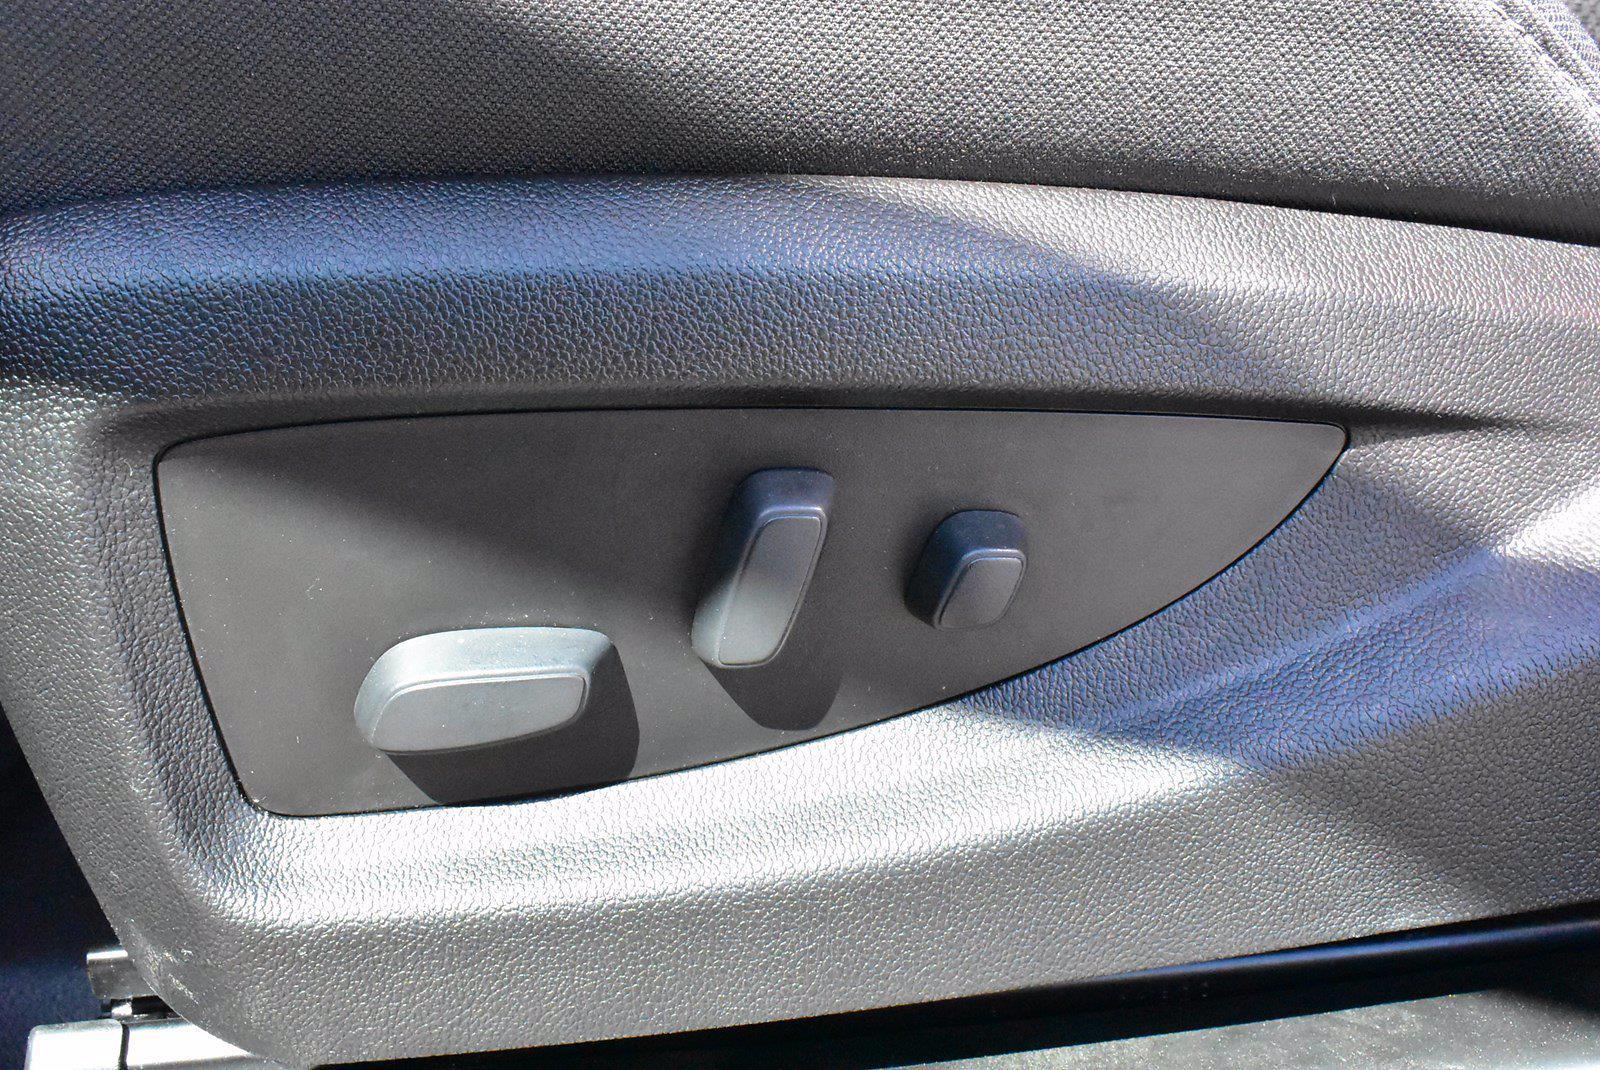 2020 Chevrolet Silverado 5500 DRW 4x2, Cab Chassis #D100225 - photo 6